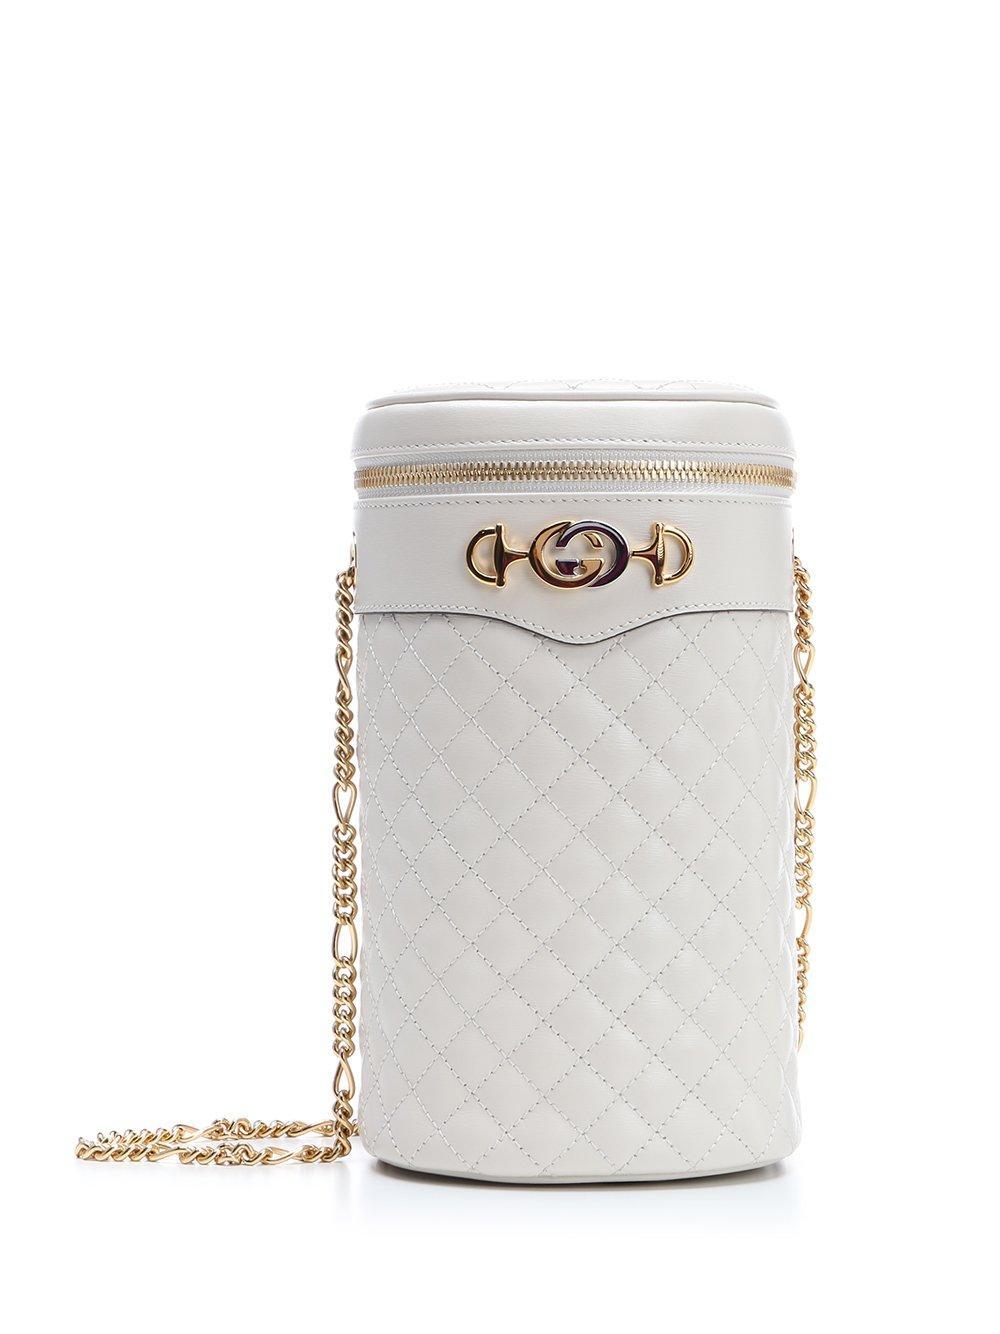 6e3fecdd6598 Gucci Quilted Horsebit Belt Bag in White - Lyst